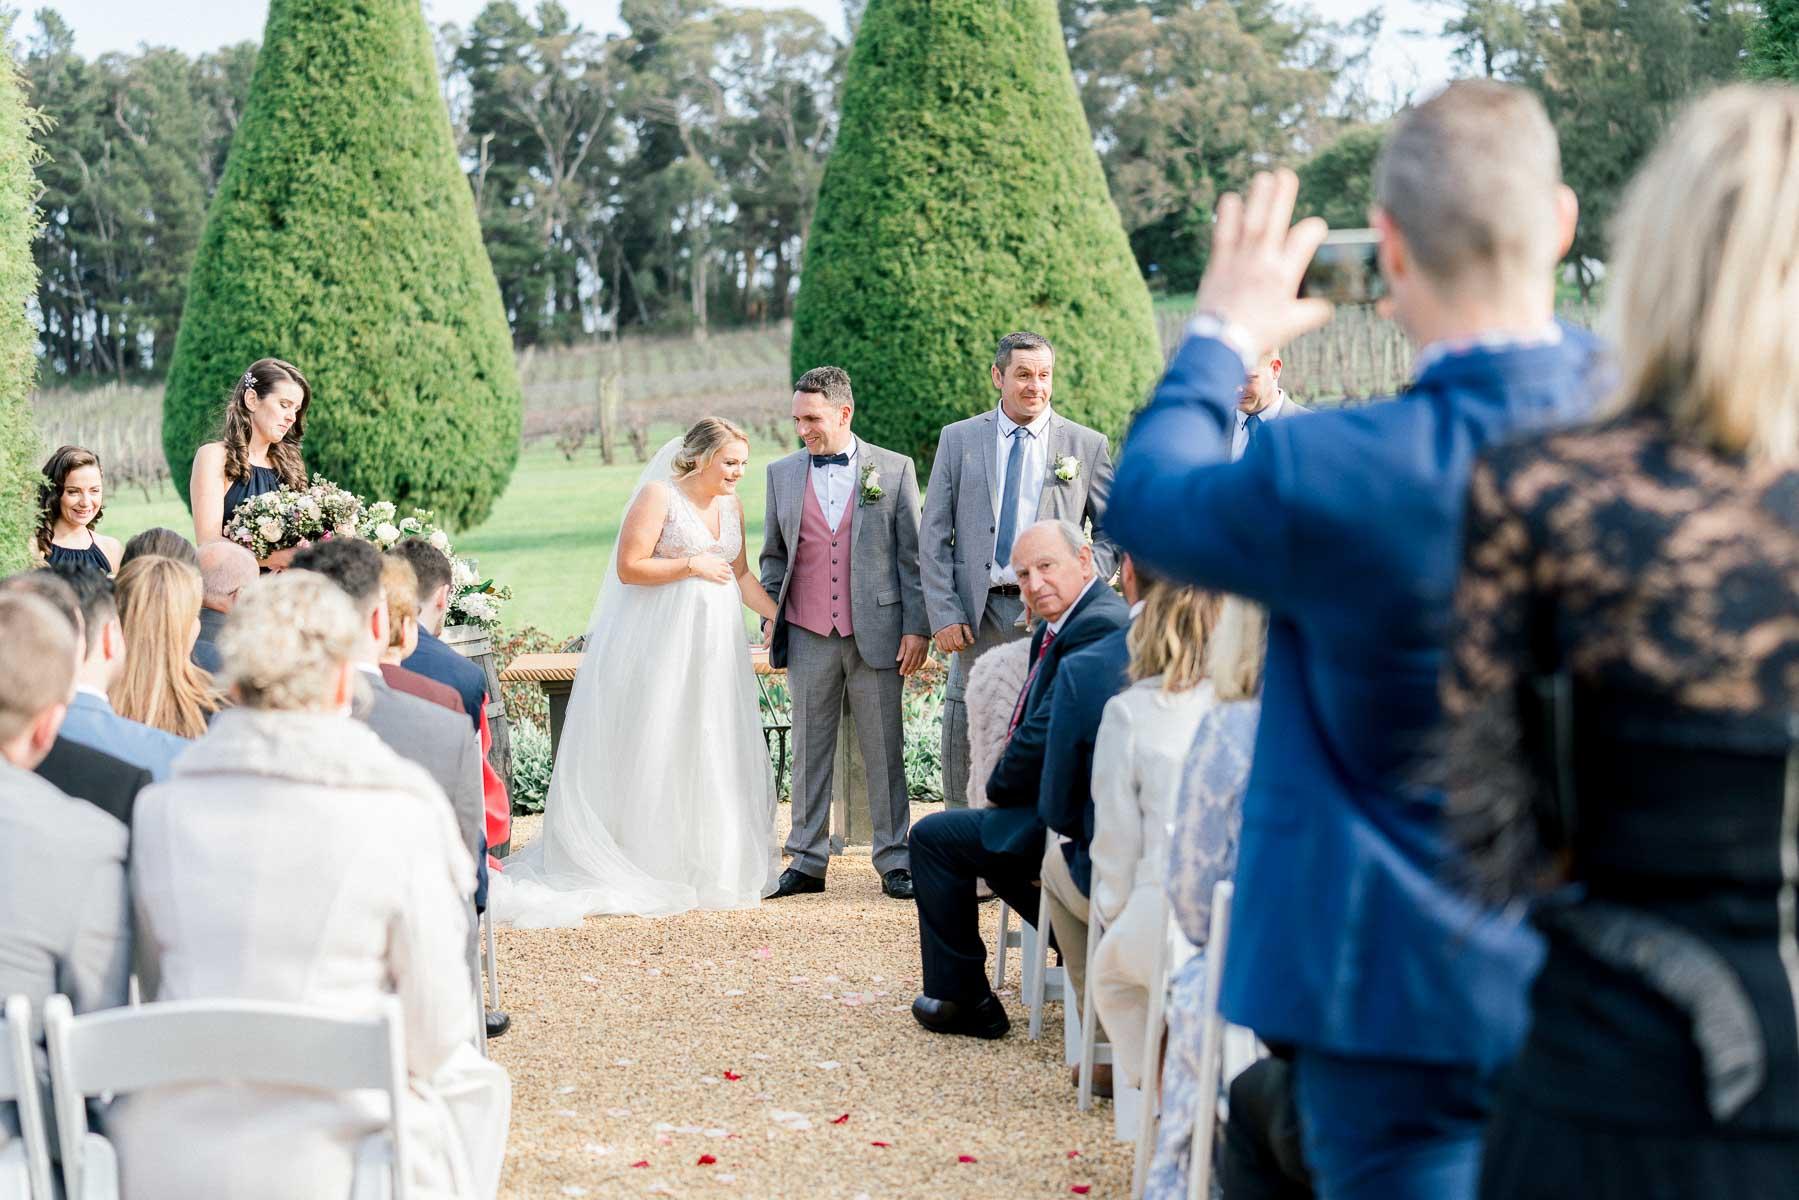 lindenderry-wedding-heart+soul-weddings-amy-alain-03224.jpg